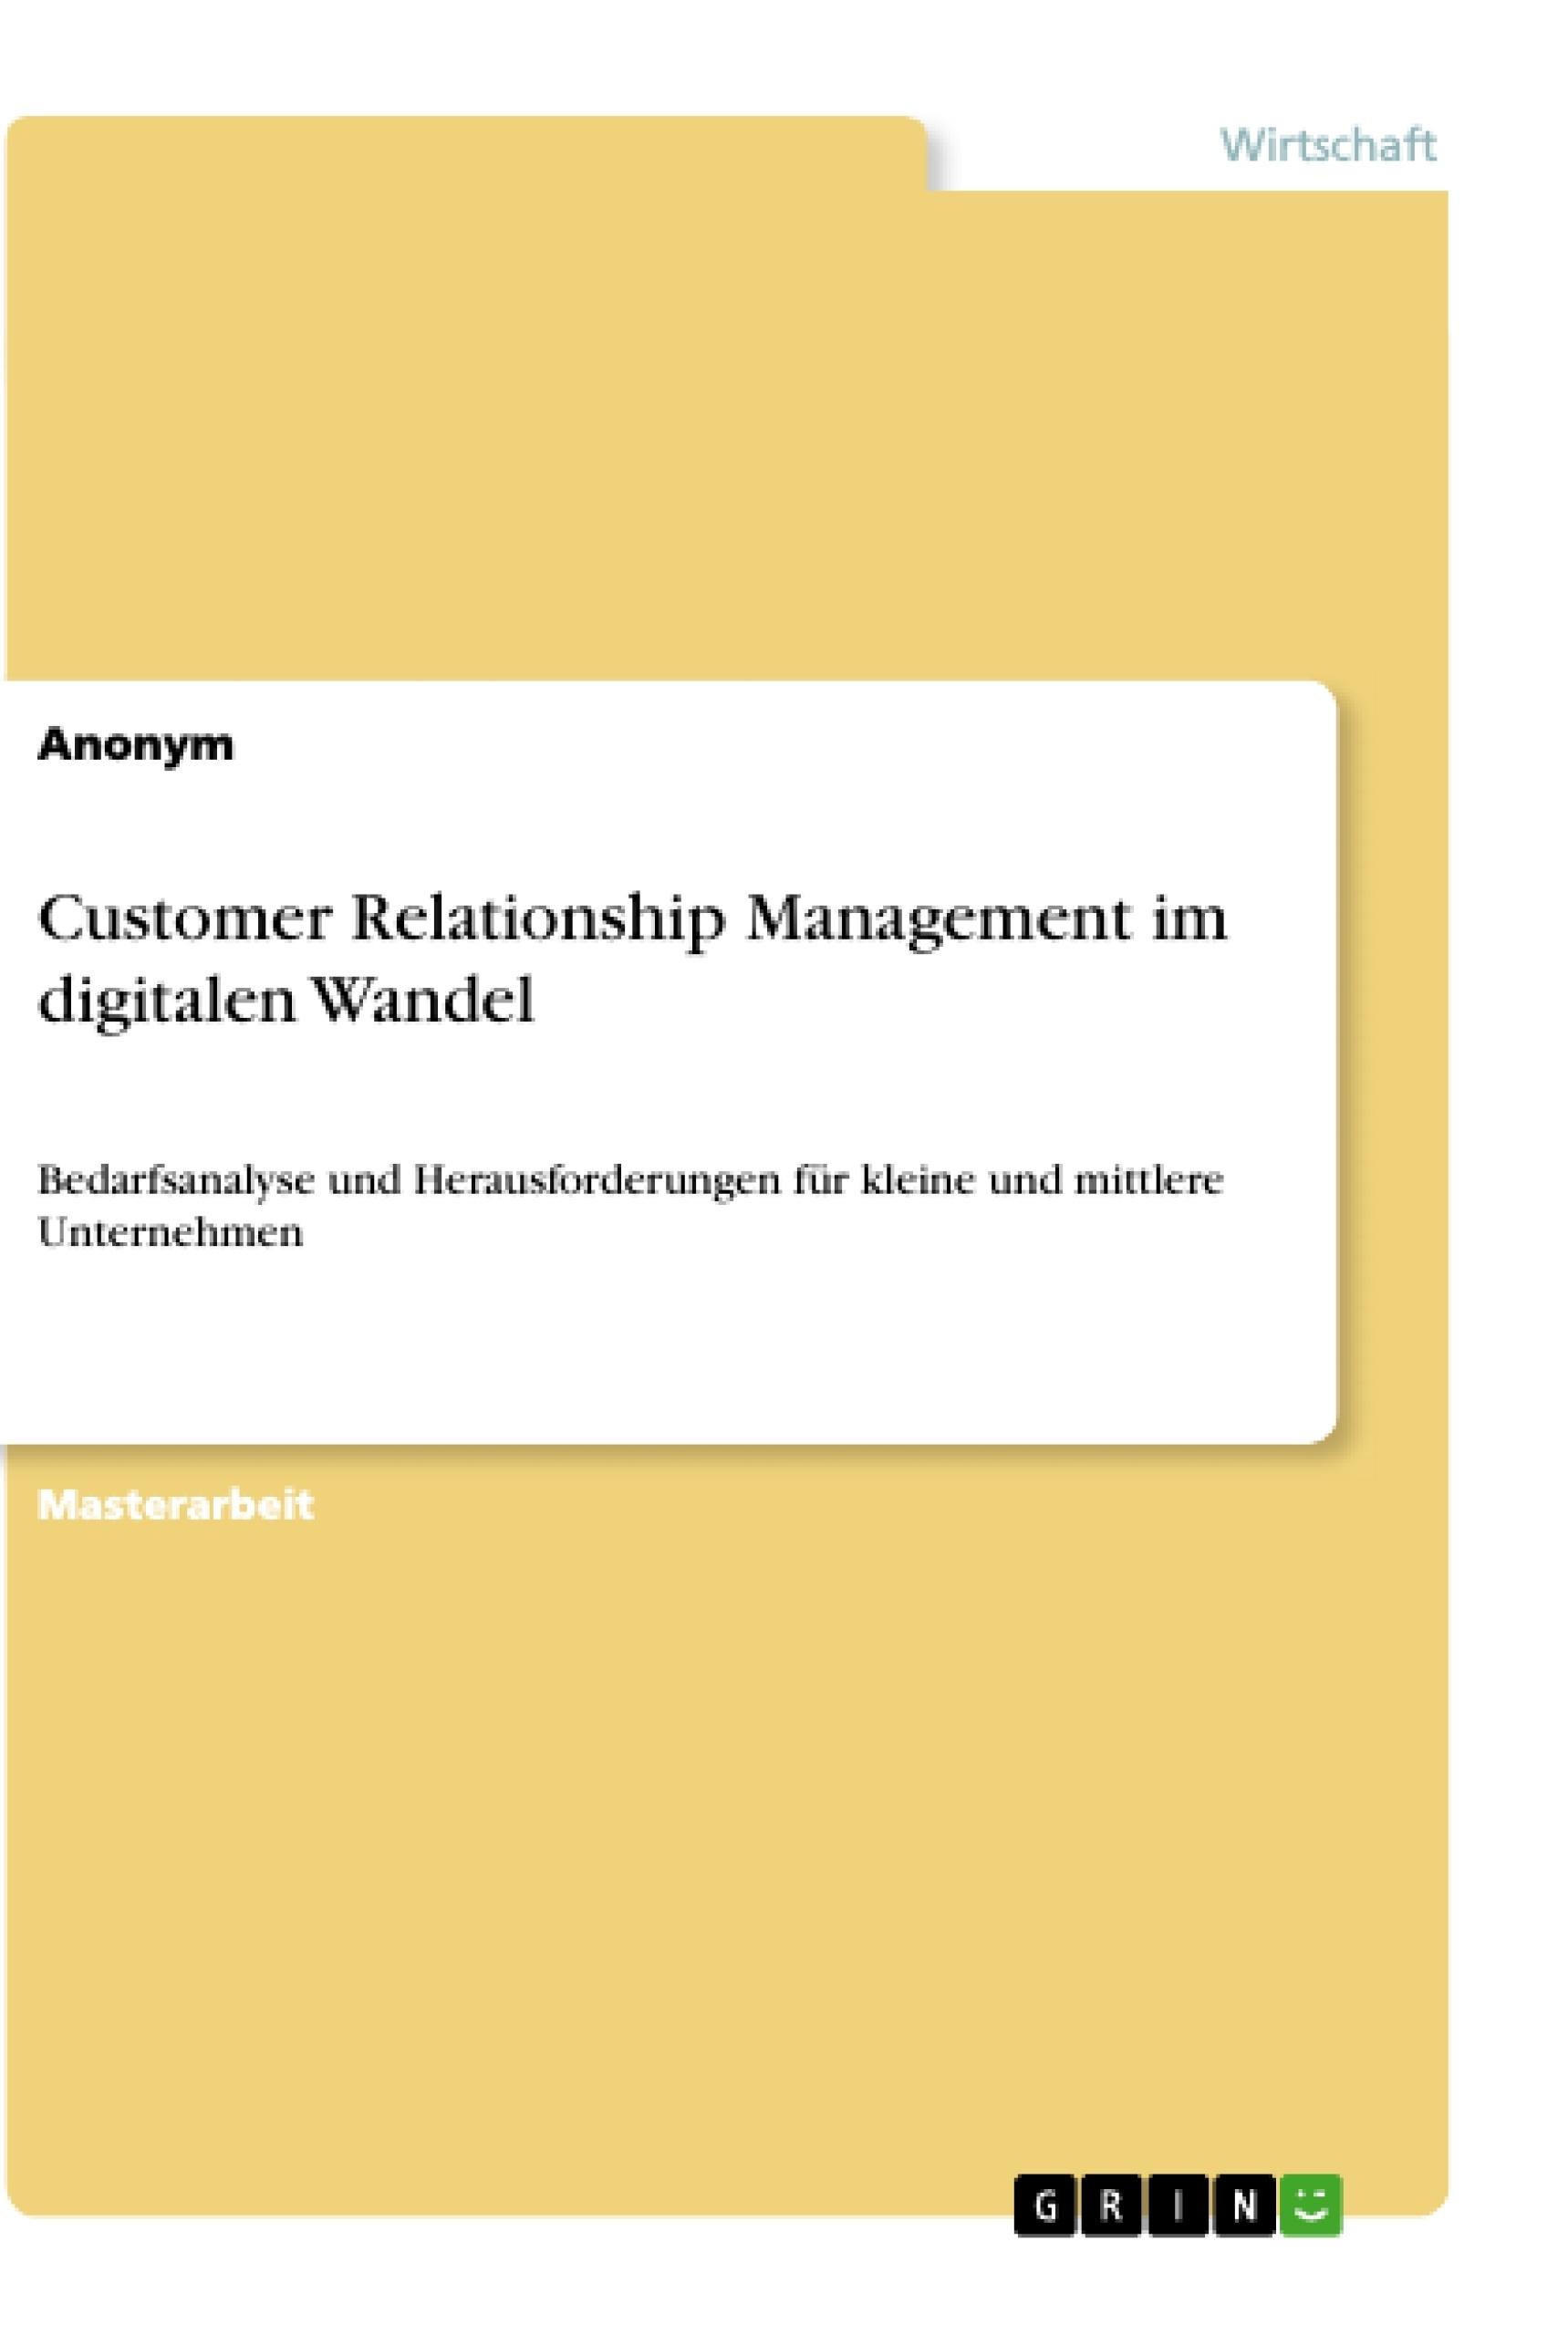 Titel: Customer Relationship Management im digitalen Wandel